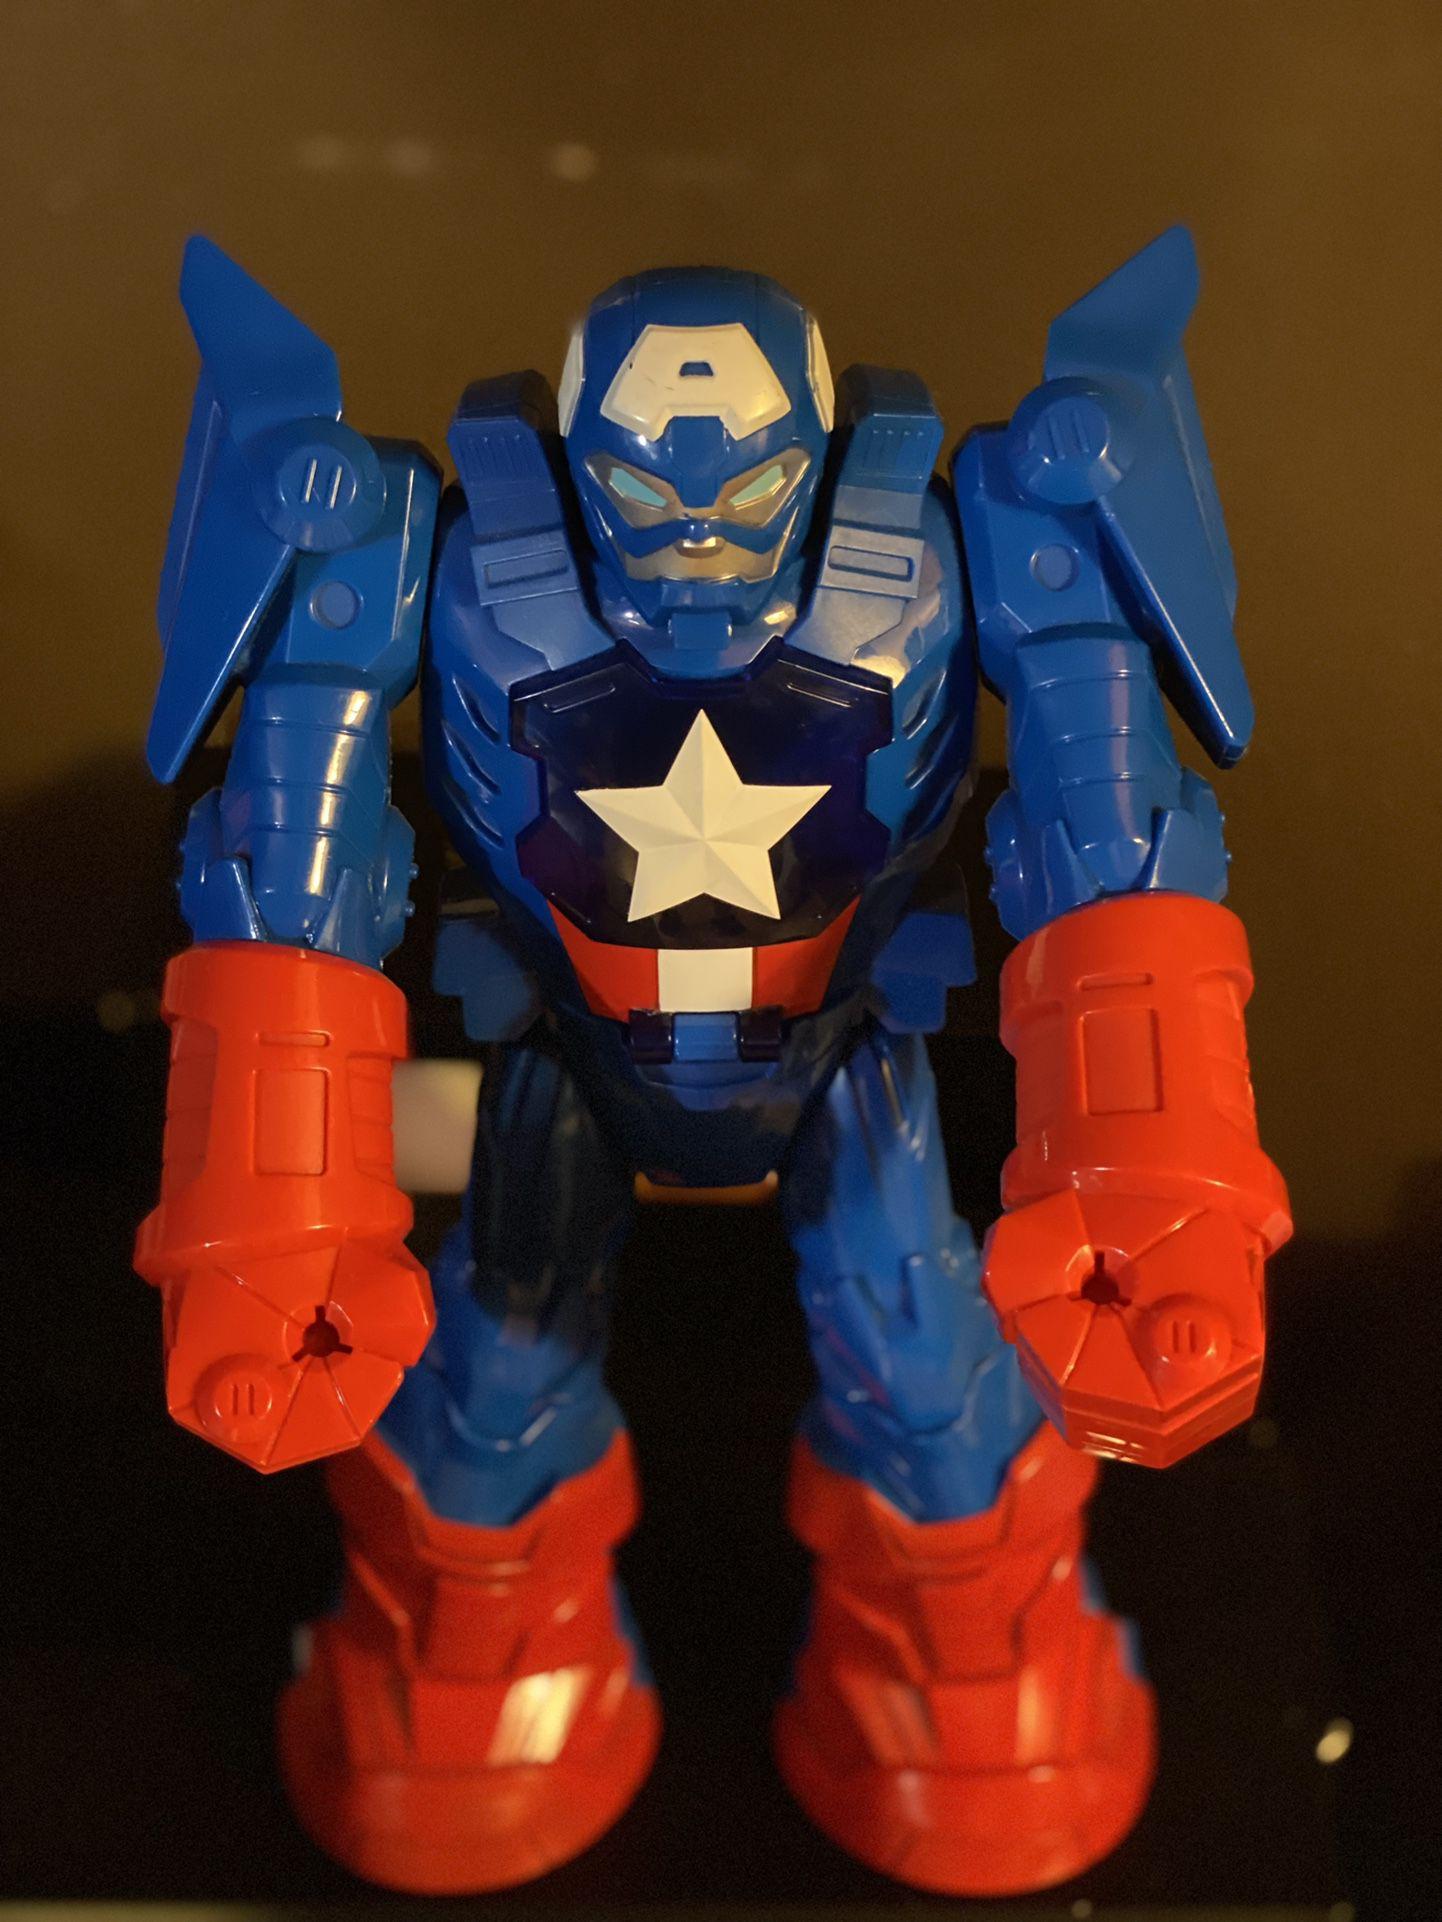 Captain America Robot Figure